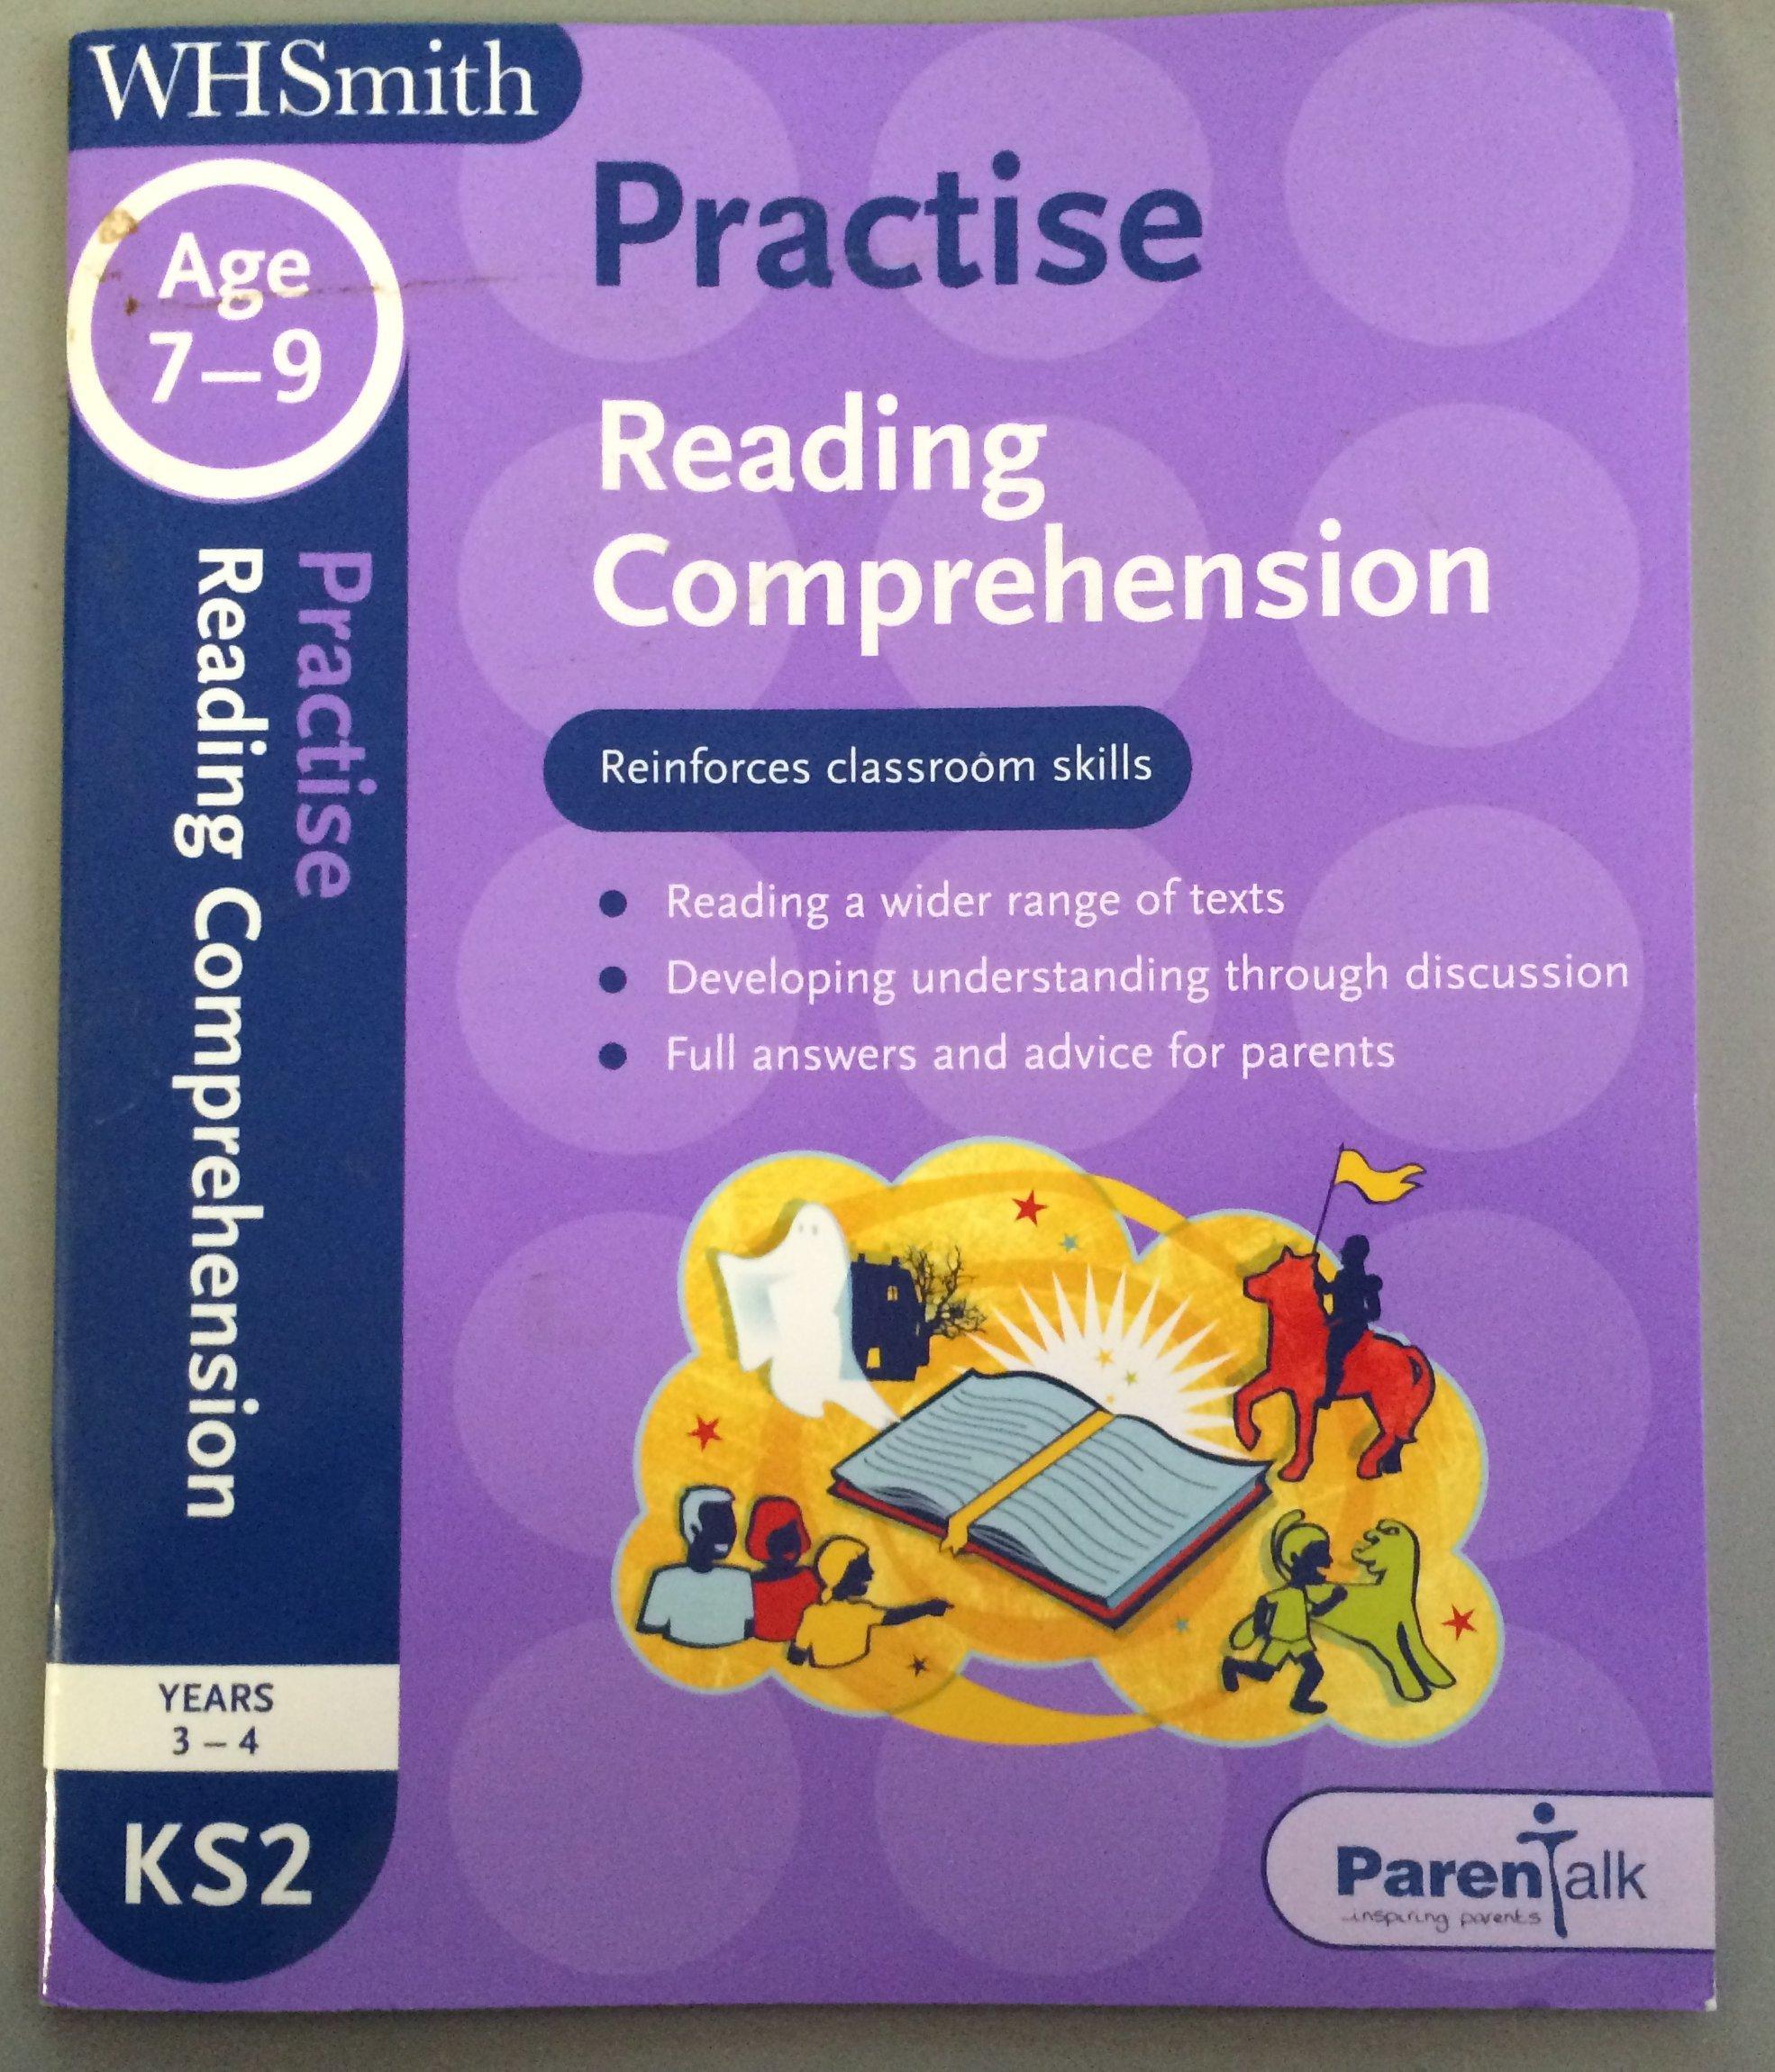 - WHS Practice KS2 Reading Comprehension: Brenda Stones